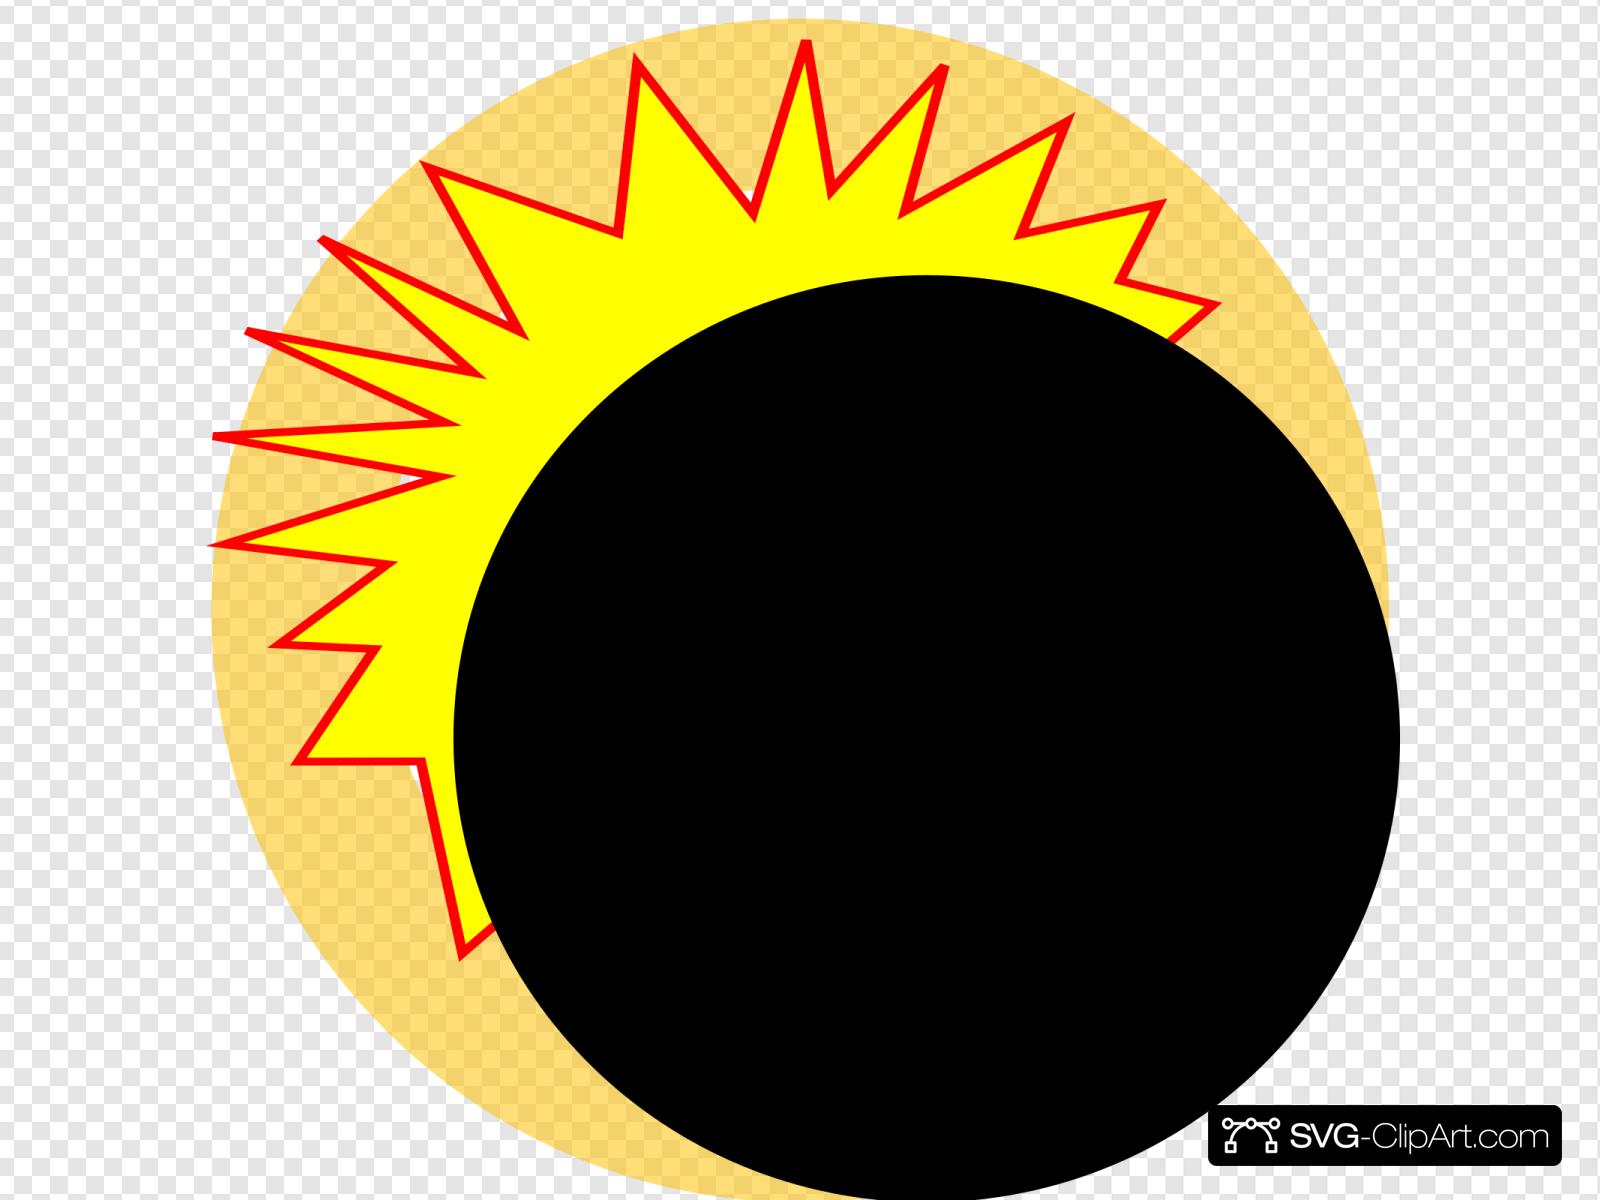 Eclipse Cartoon Clip art, Icon and SVG.